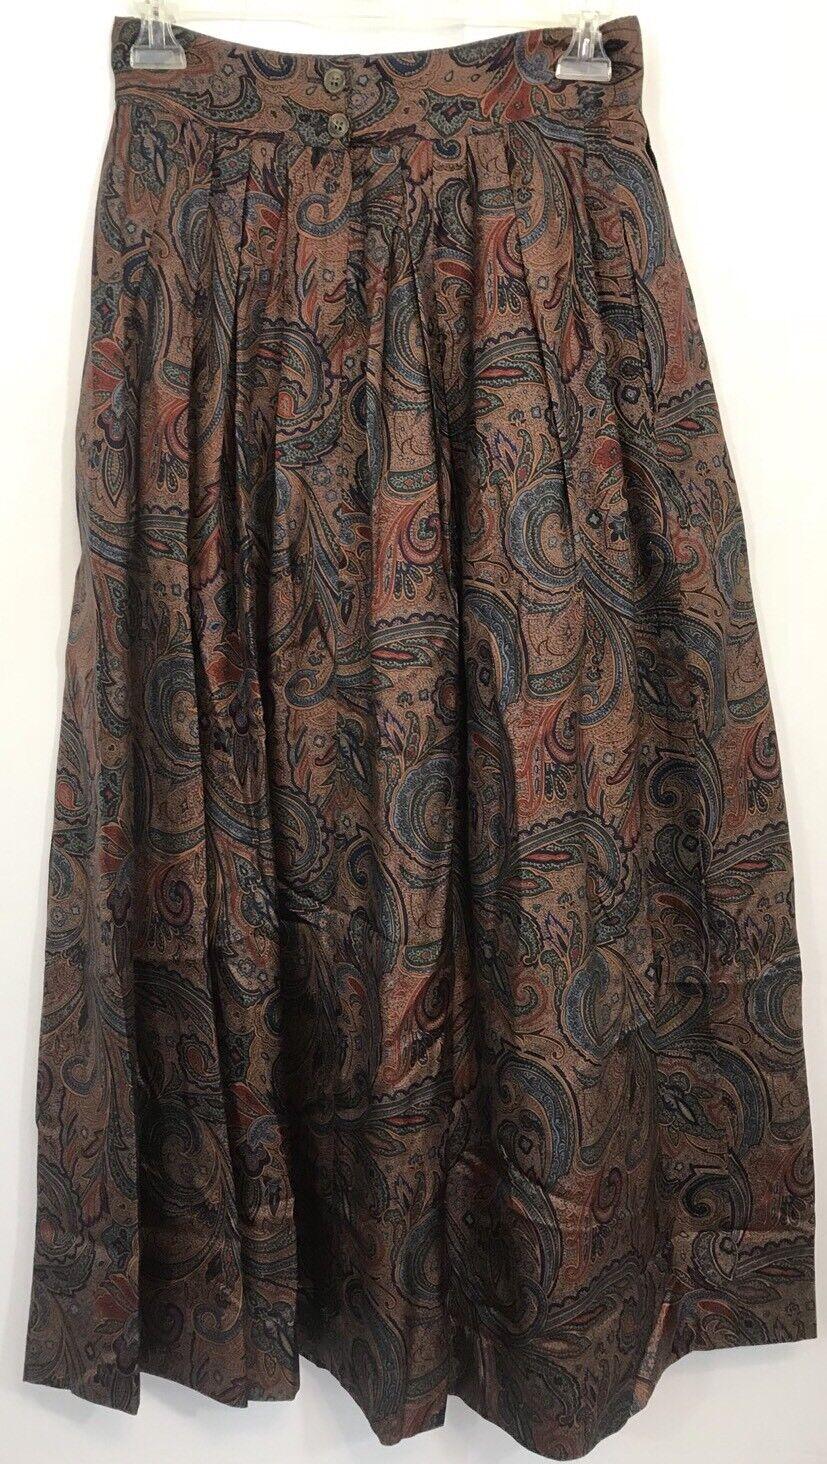 Vintage Dgoldthy Bullitt 100% Silk Paisley Skirt Size 8 Ardmore Chestnut Hill PA